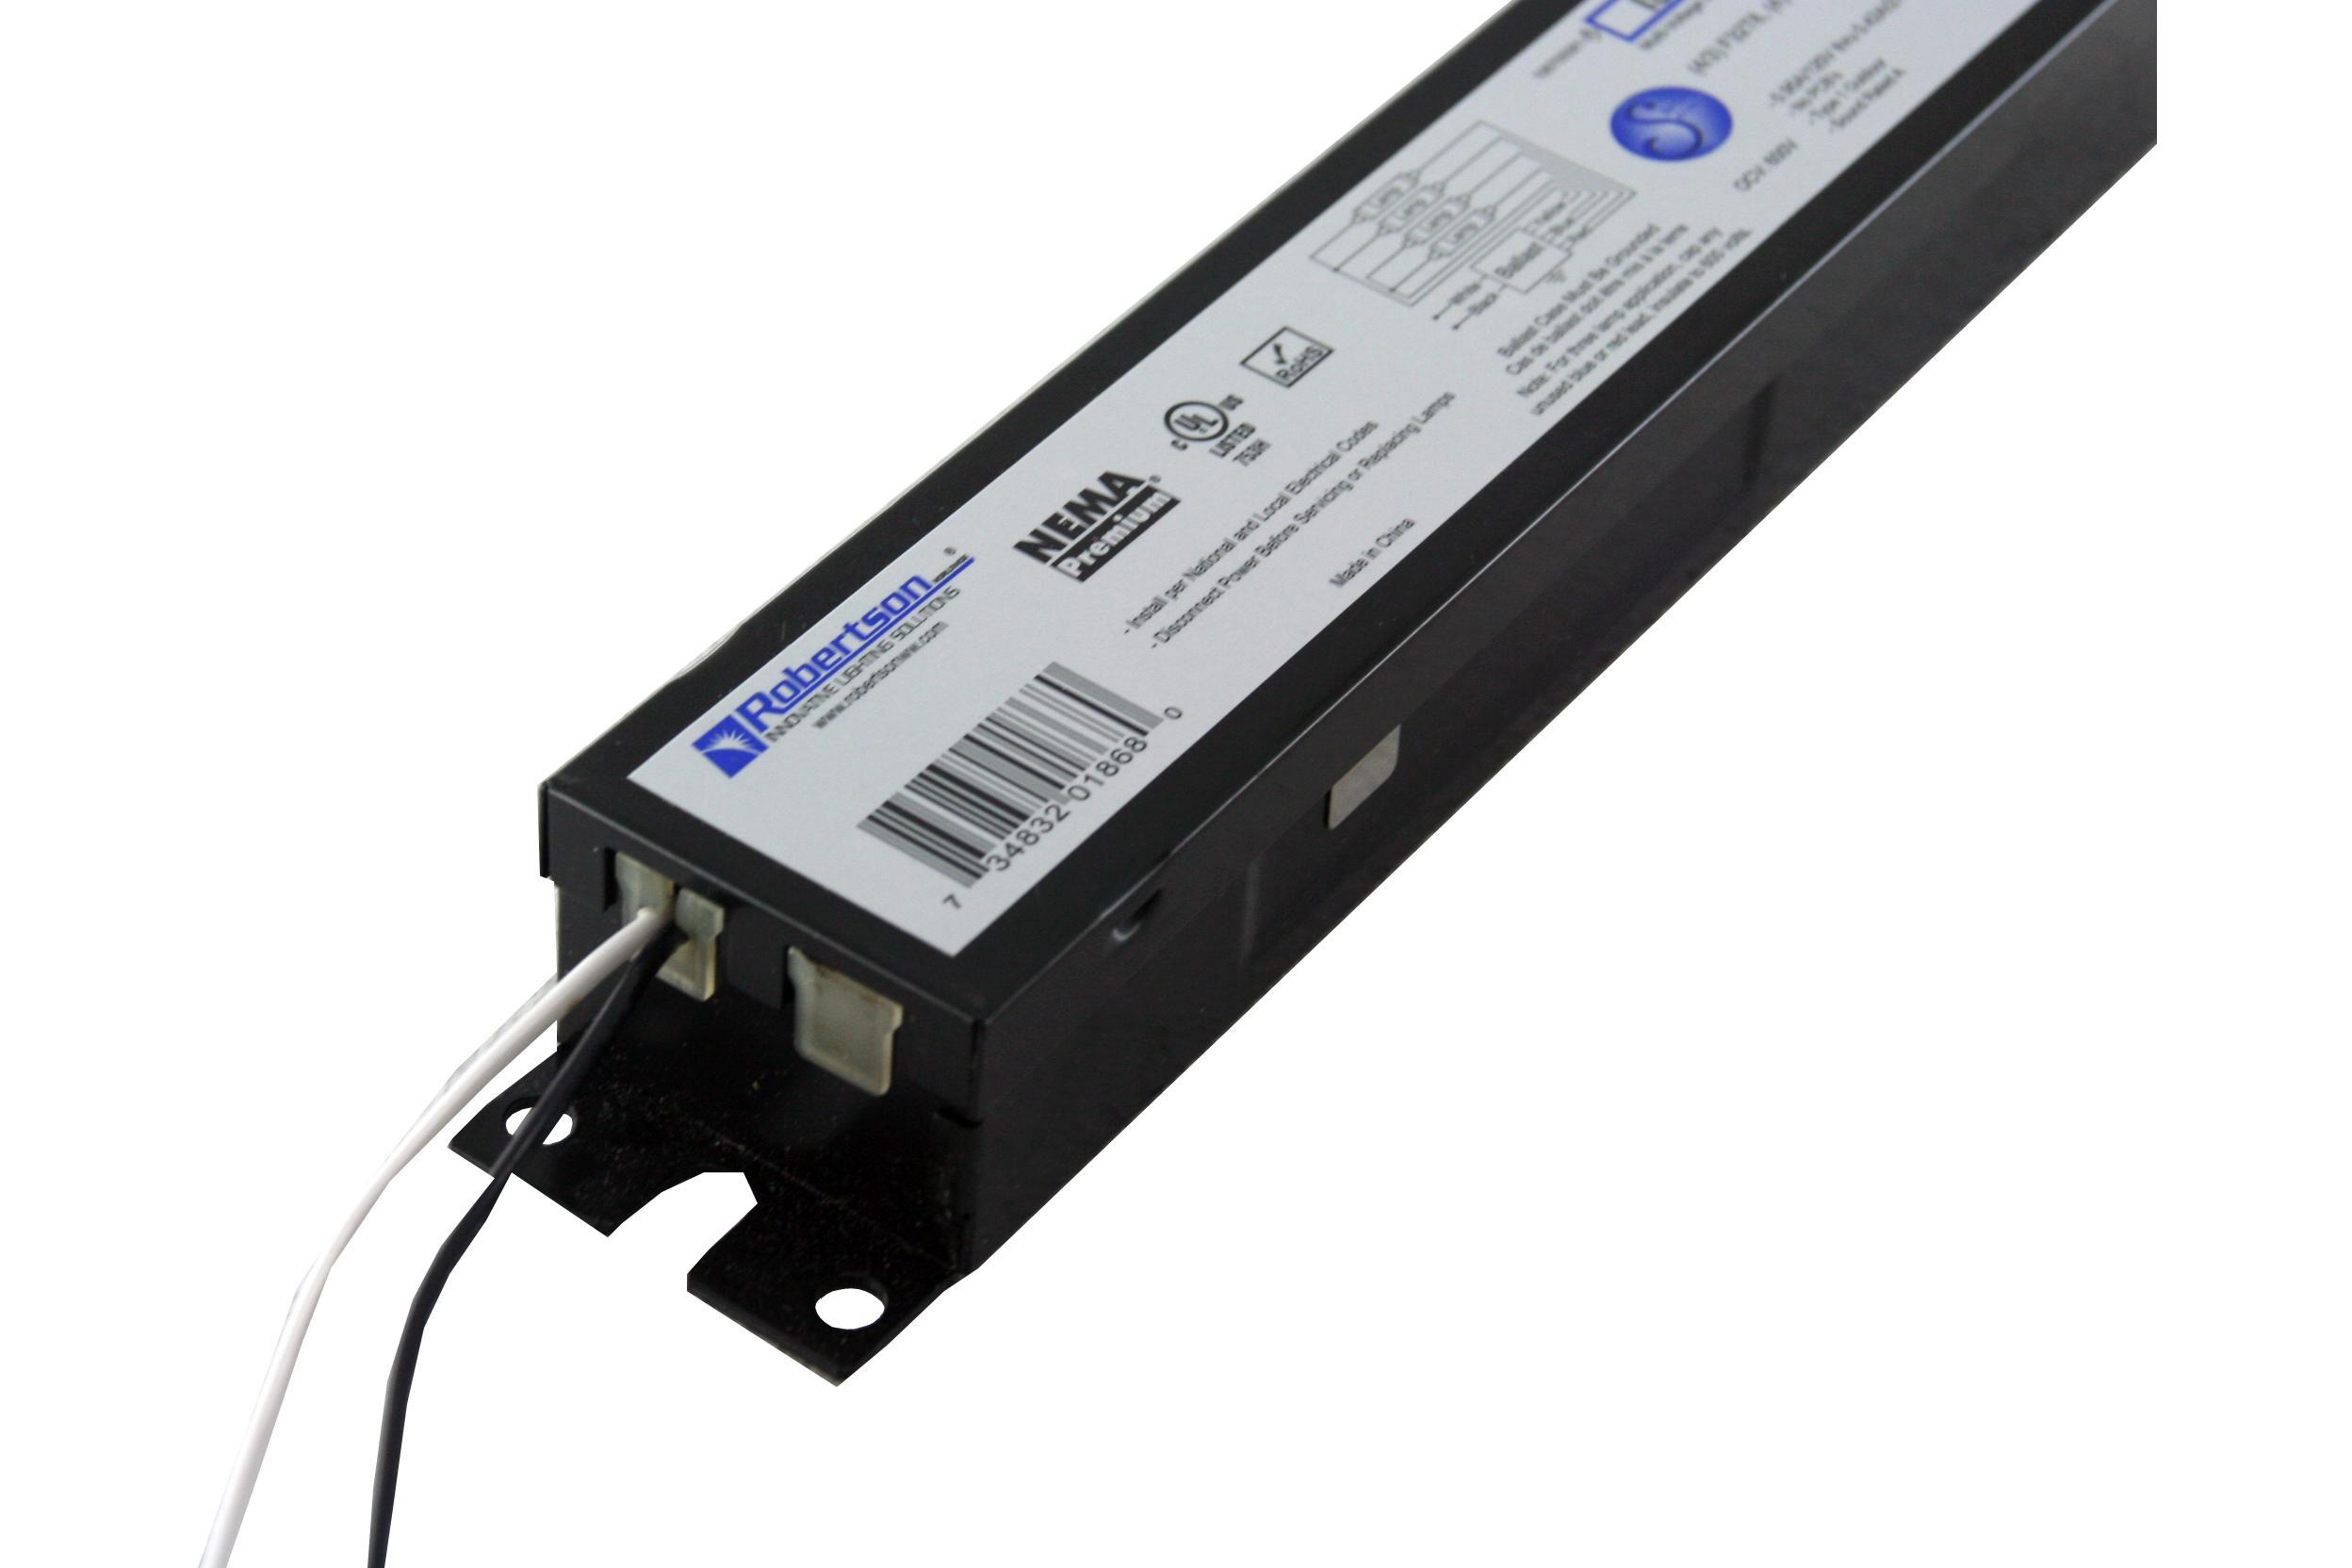 Robertson Worldwide Isl432t8hemv Ah 3p20160 120 277 Vac 50 60 Hz 3 Lamp Ballast Wiring Diagram Sku Packaging Unit Quantity